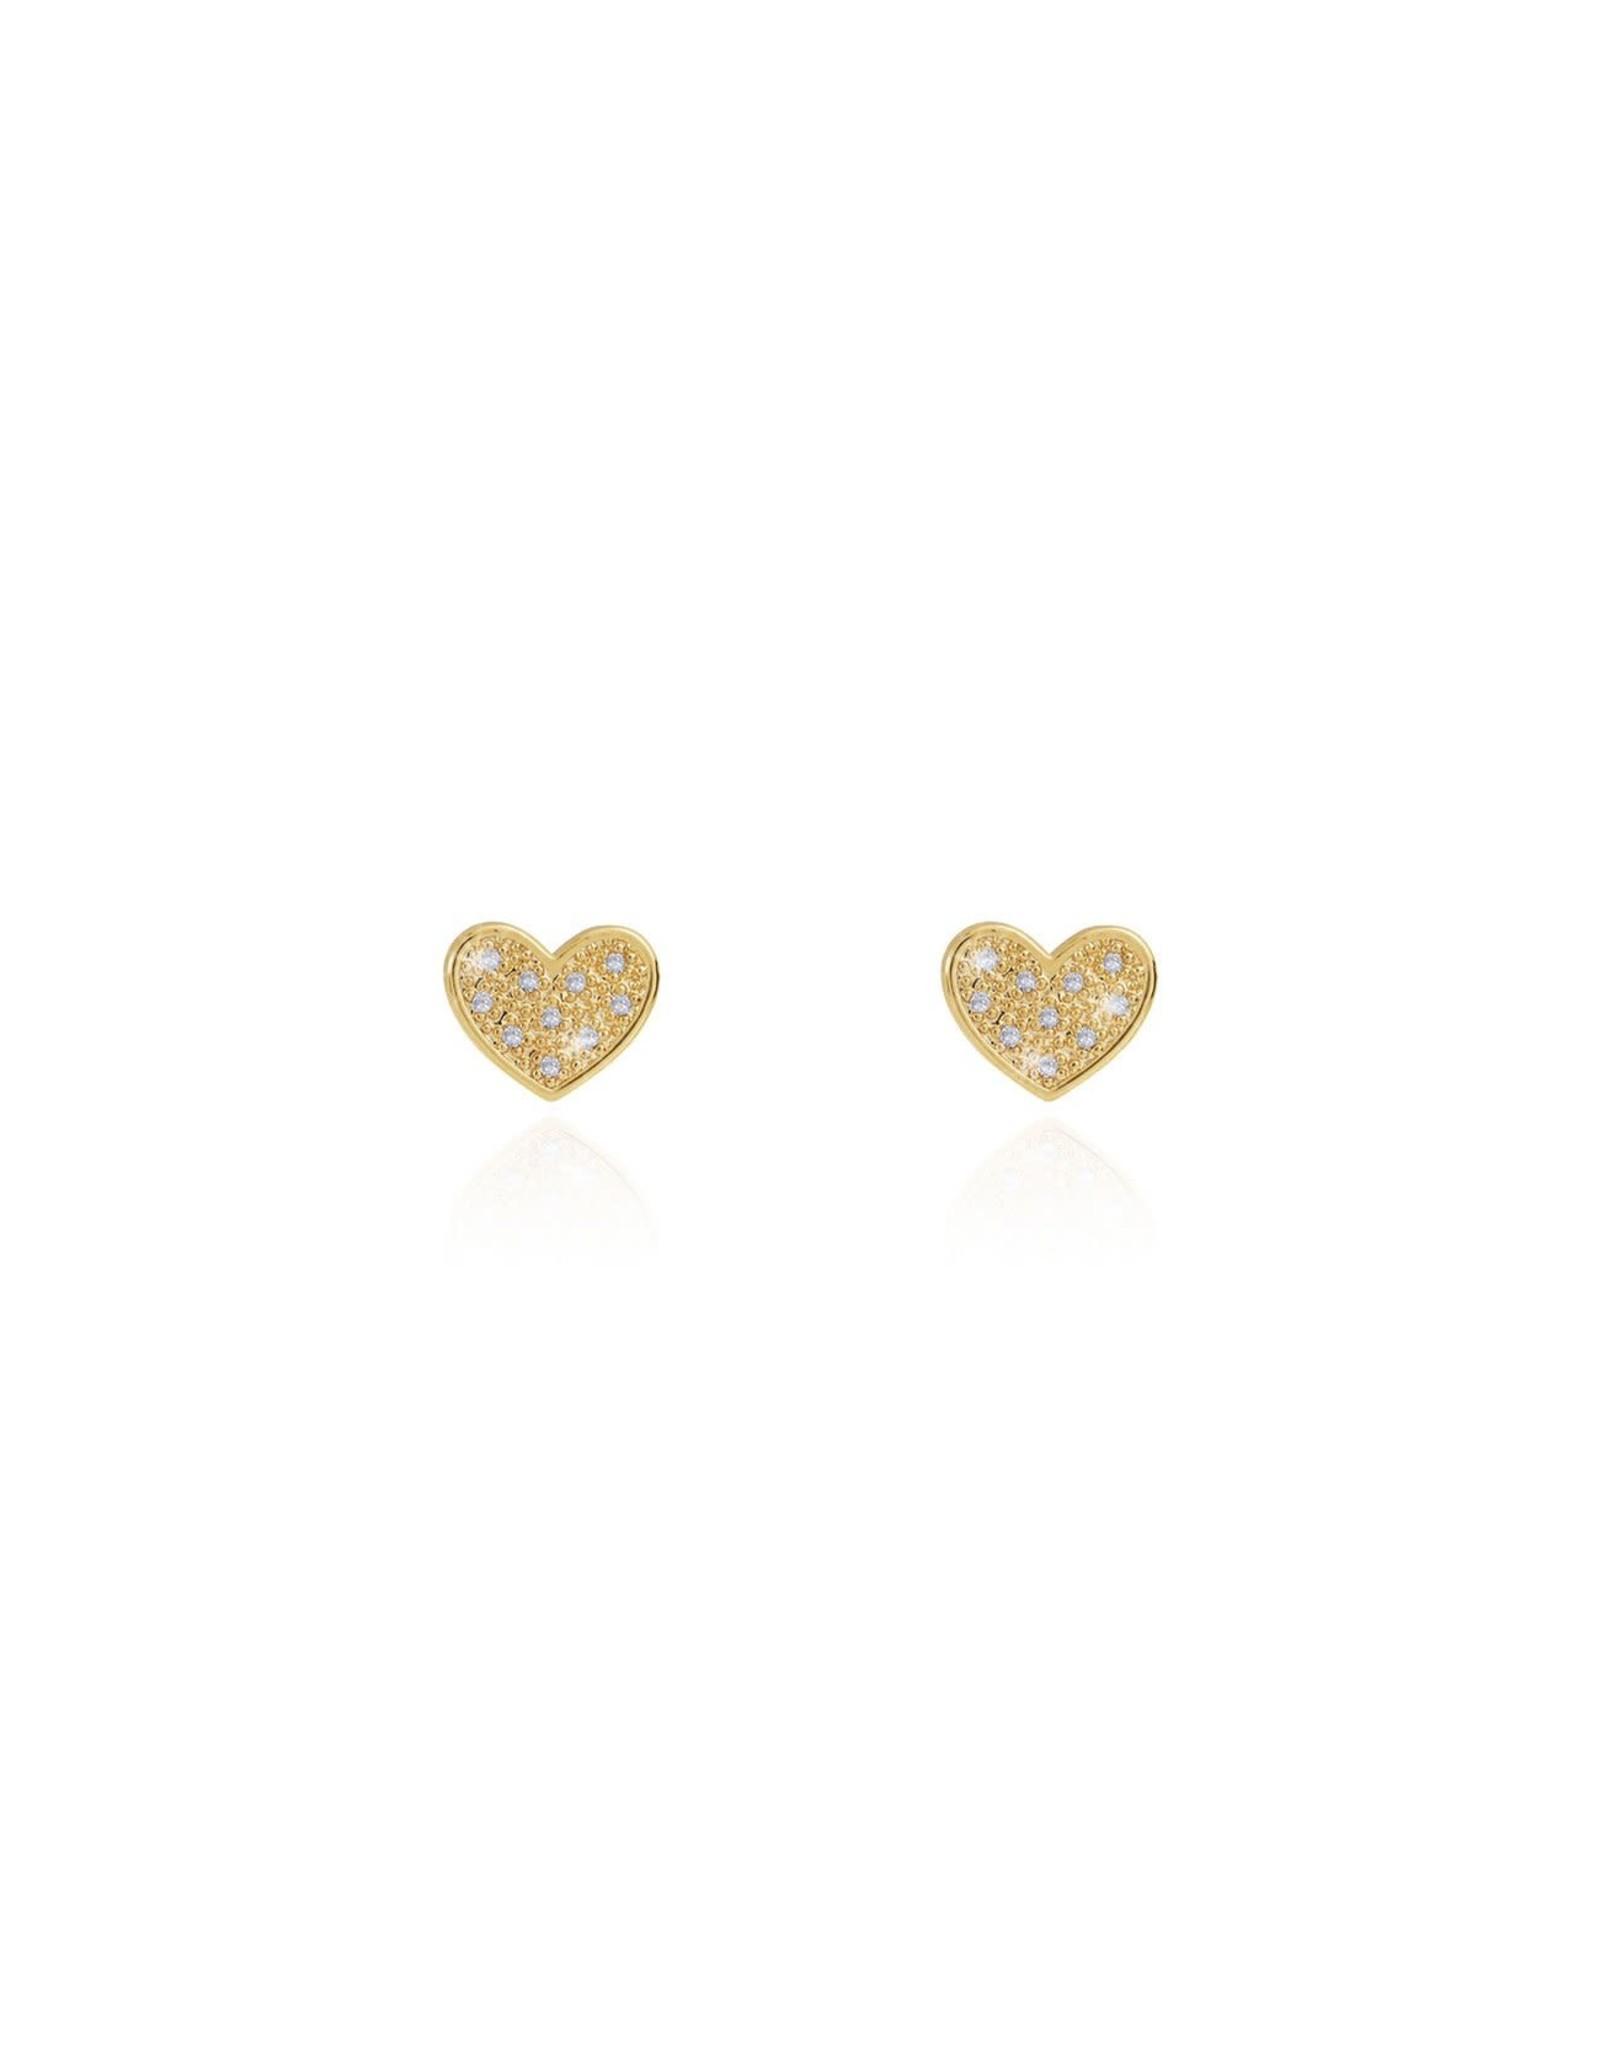 Joma Jewellery Treasure the Little Things Oorbellen- Live Love Sparkle